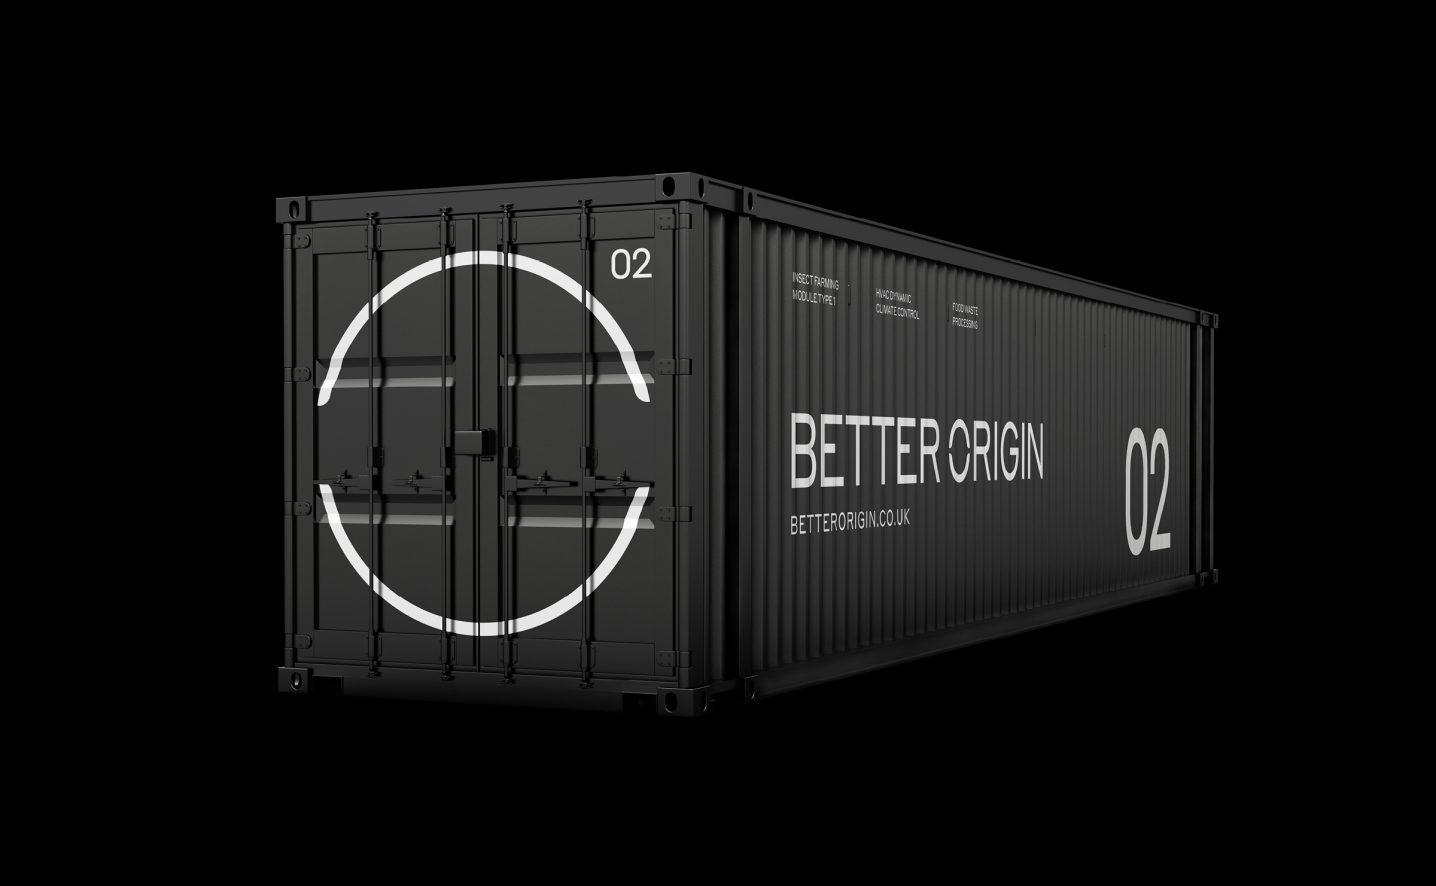 Better origin brand identity container